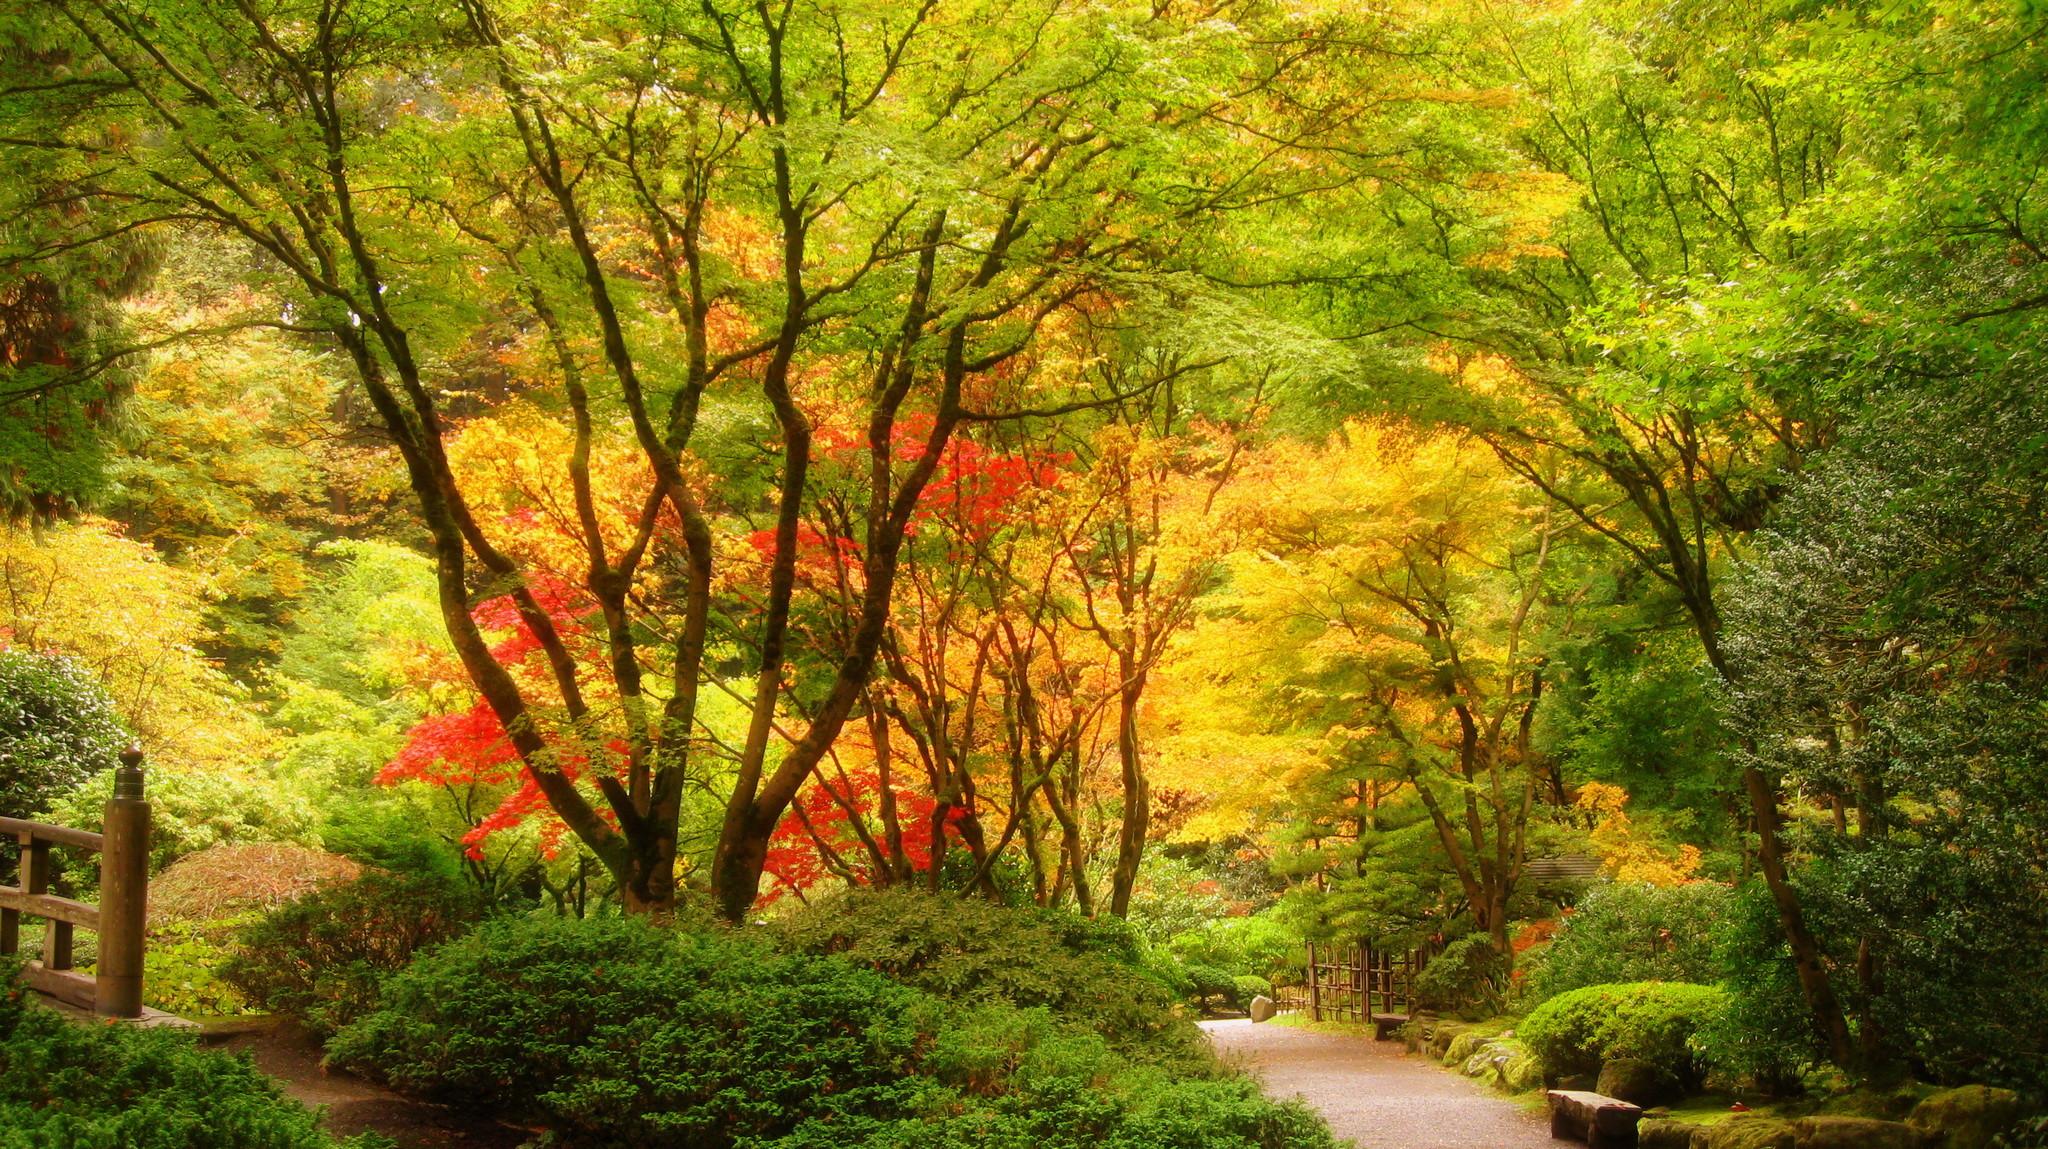 Wallpapers USA Portland Japanese Nature Gardens Trees 2048×1149